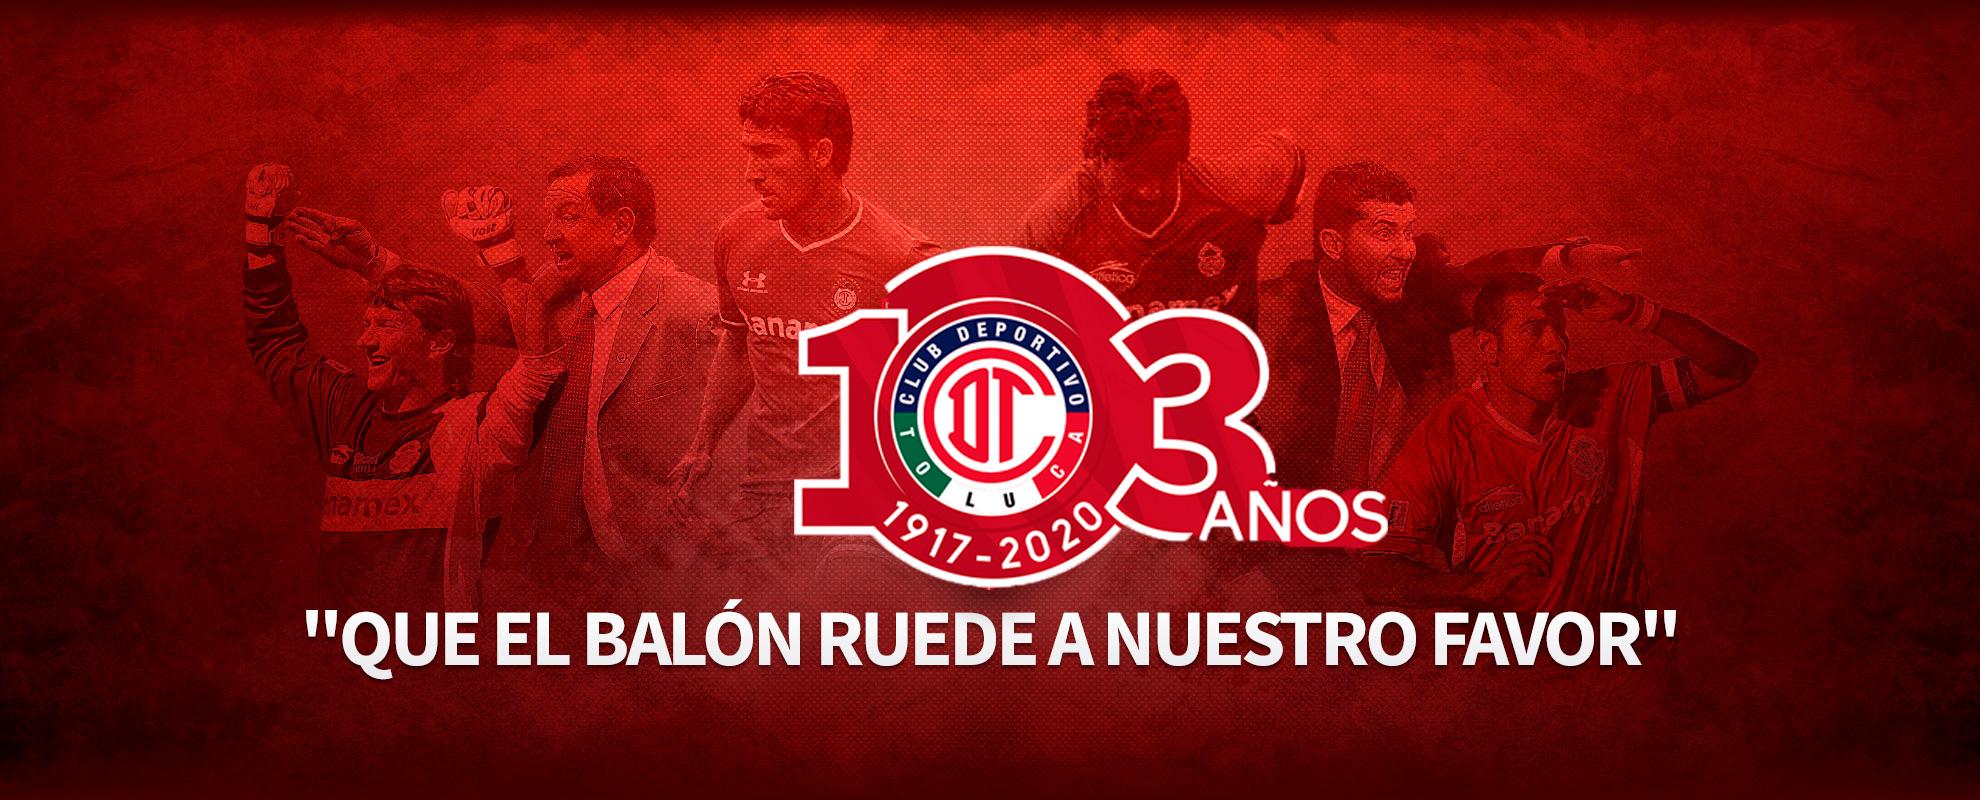 Club Deportivo Toluca 103 años